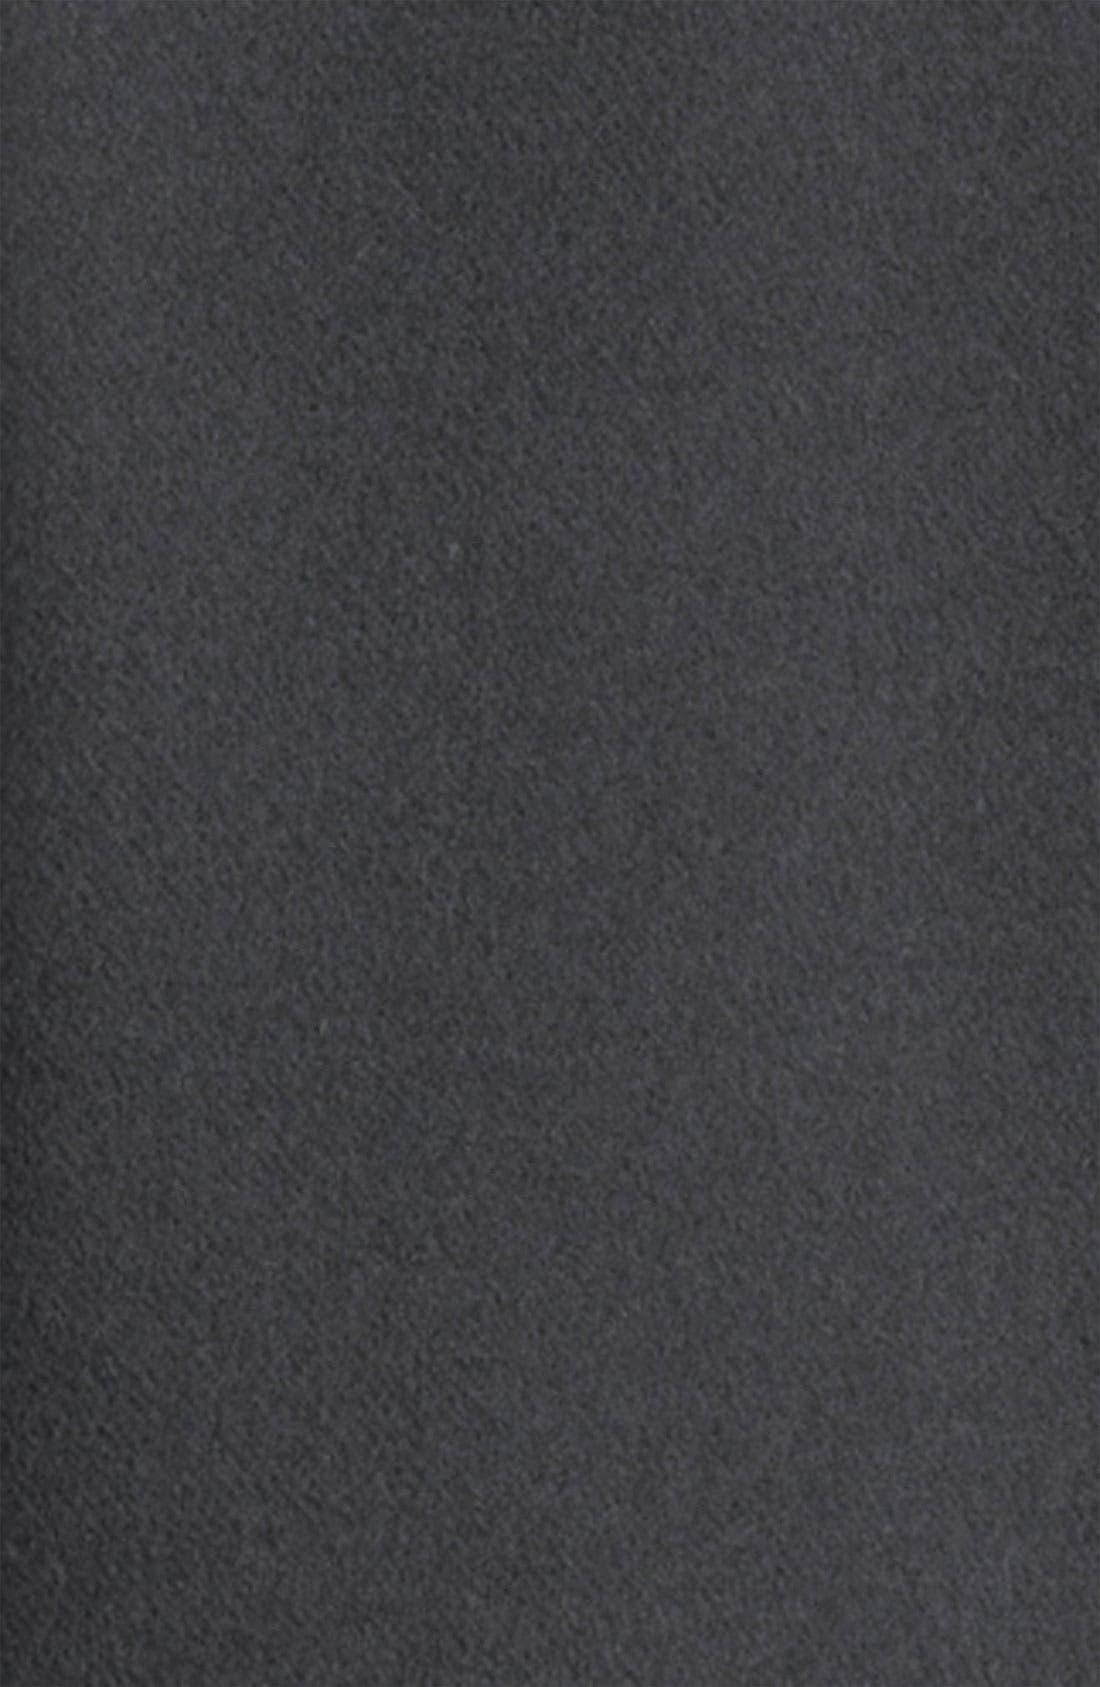 Alternate Image 3  - Jil Sander Double Face Wool Jacket